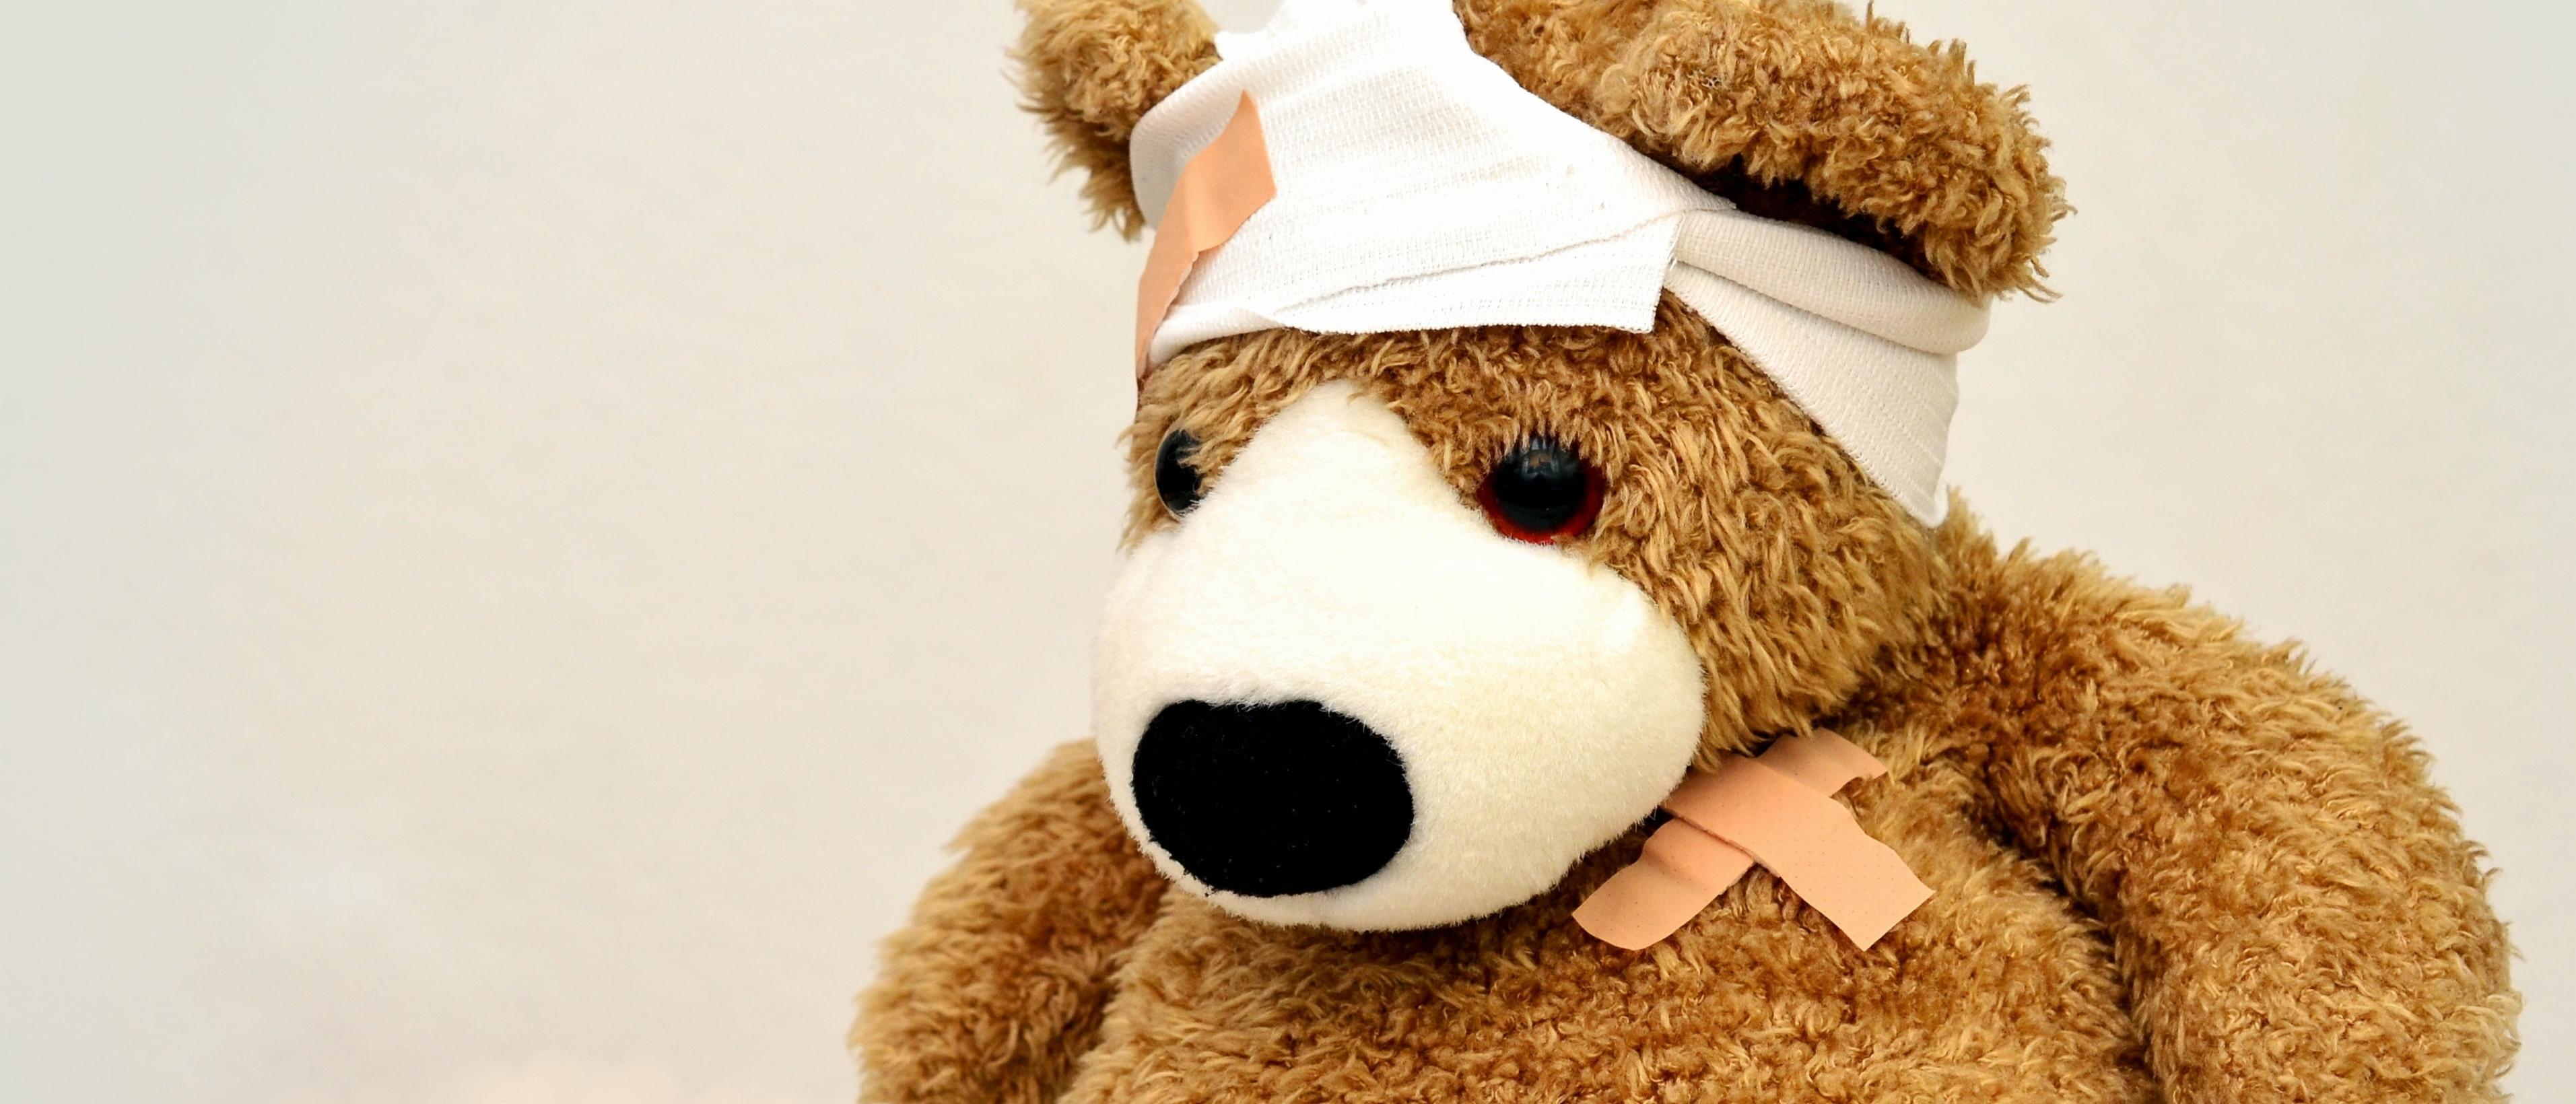 custom-Custom_Size___band-aid-bandages-hurt-42230 2-1